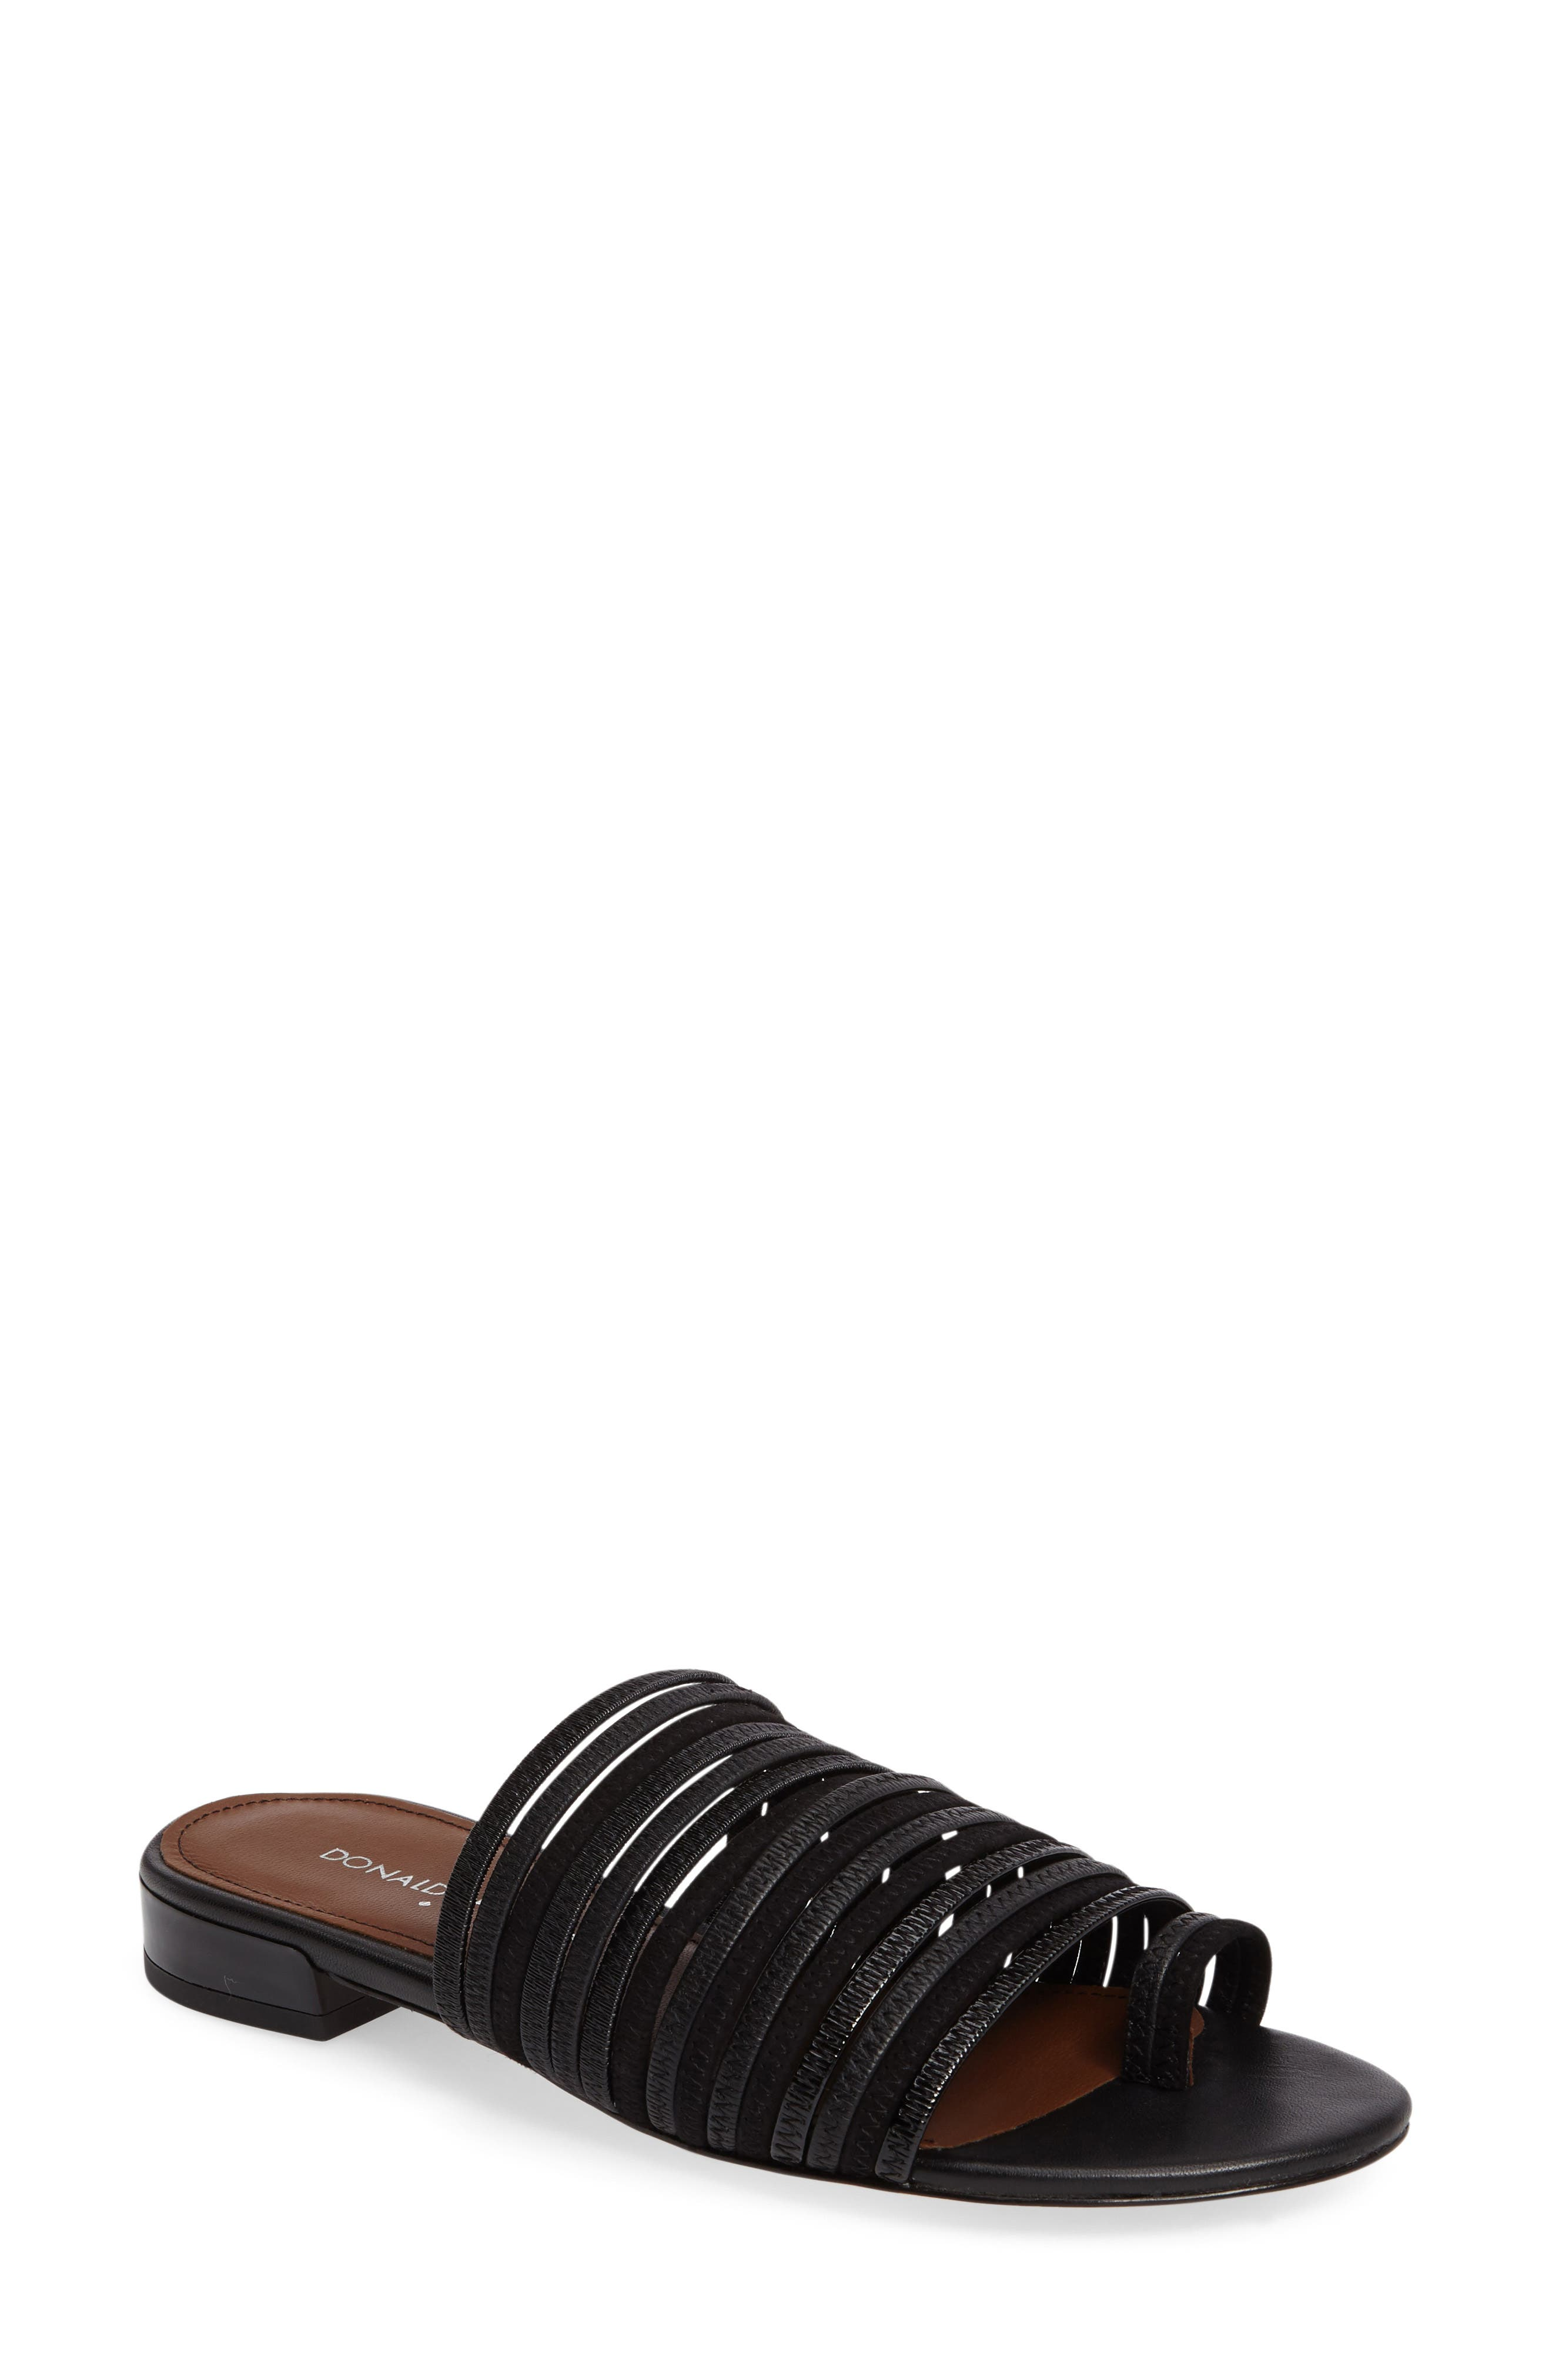 Frea Strappy Sandal,                         Main,                         color,